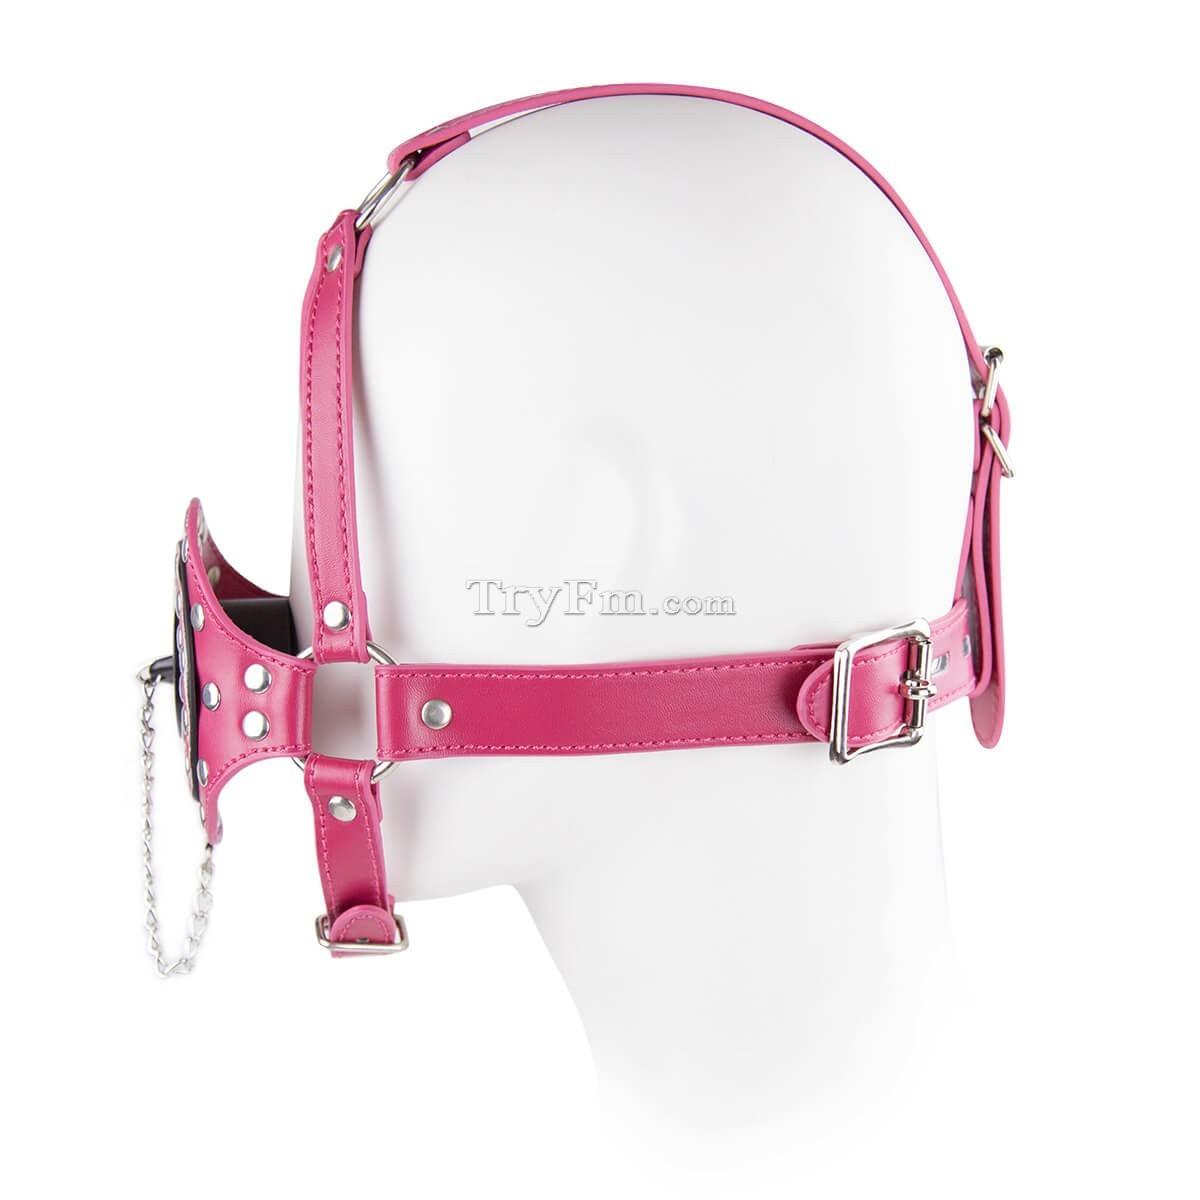 17-Plug-up-Leather-Head-Harness-Mouth-Gag-2.jpg